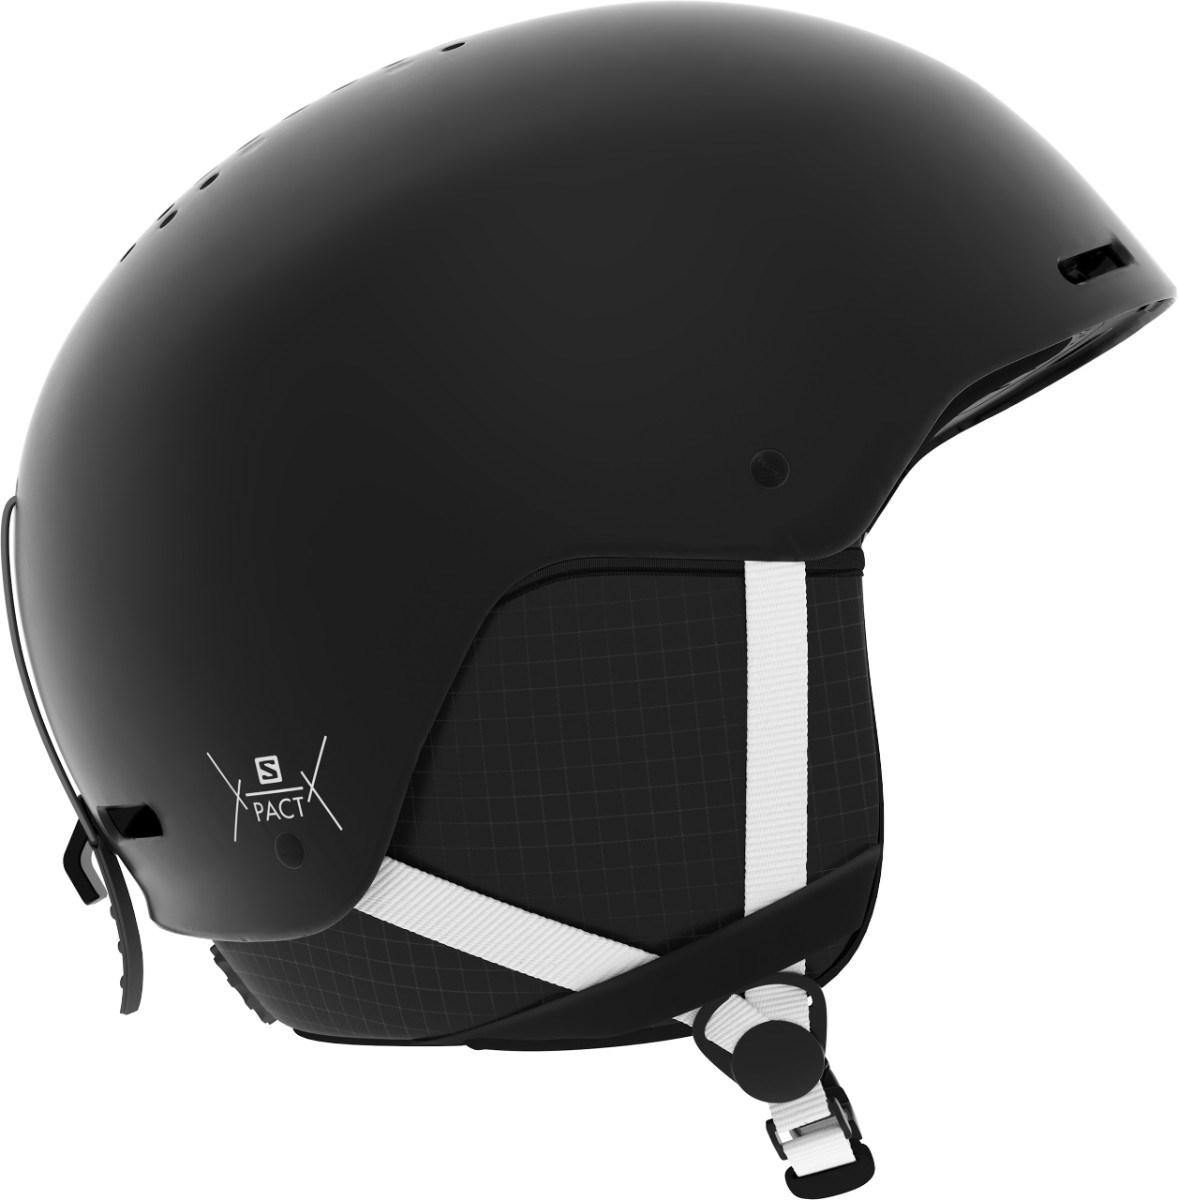 9c15b90125 Salomon Pact Junior Kids Ski Helmet 2019 Black/White